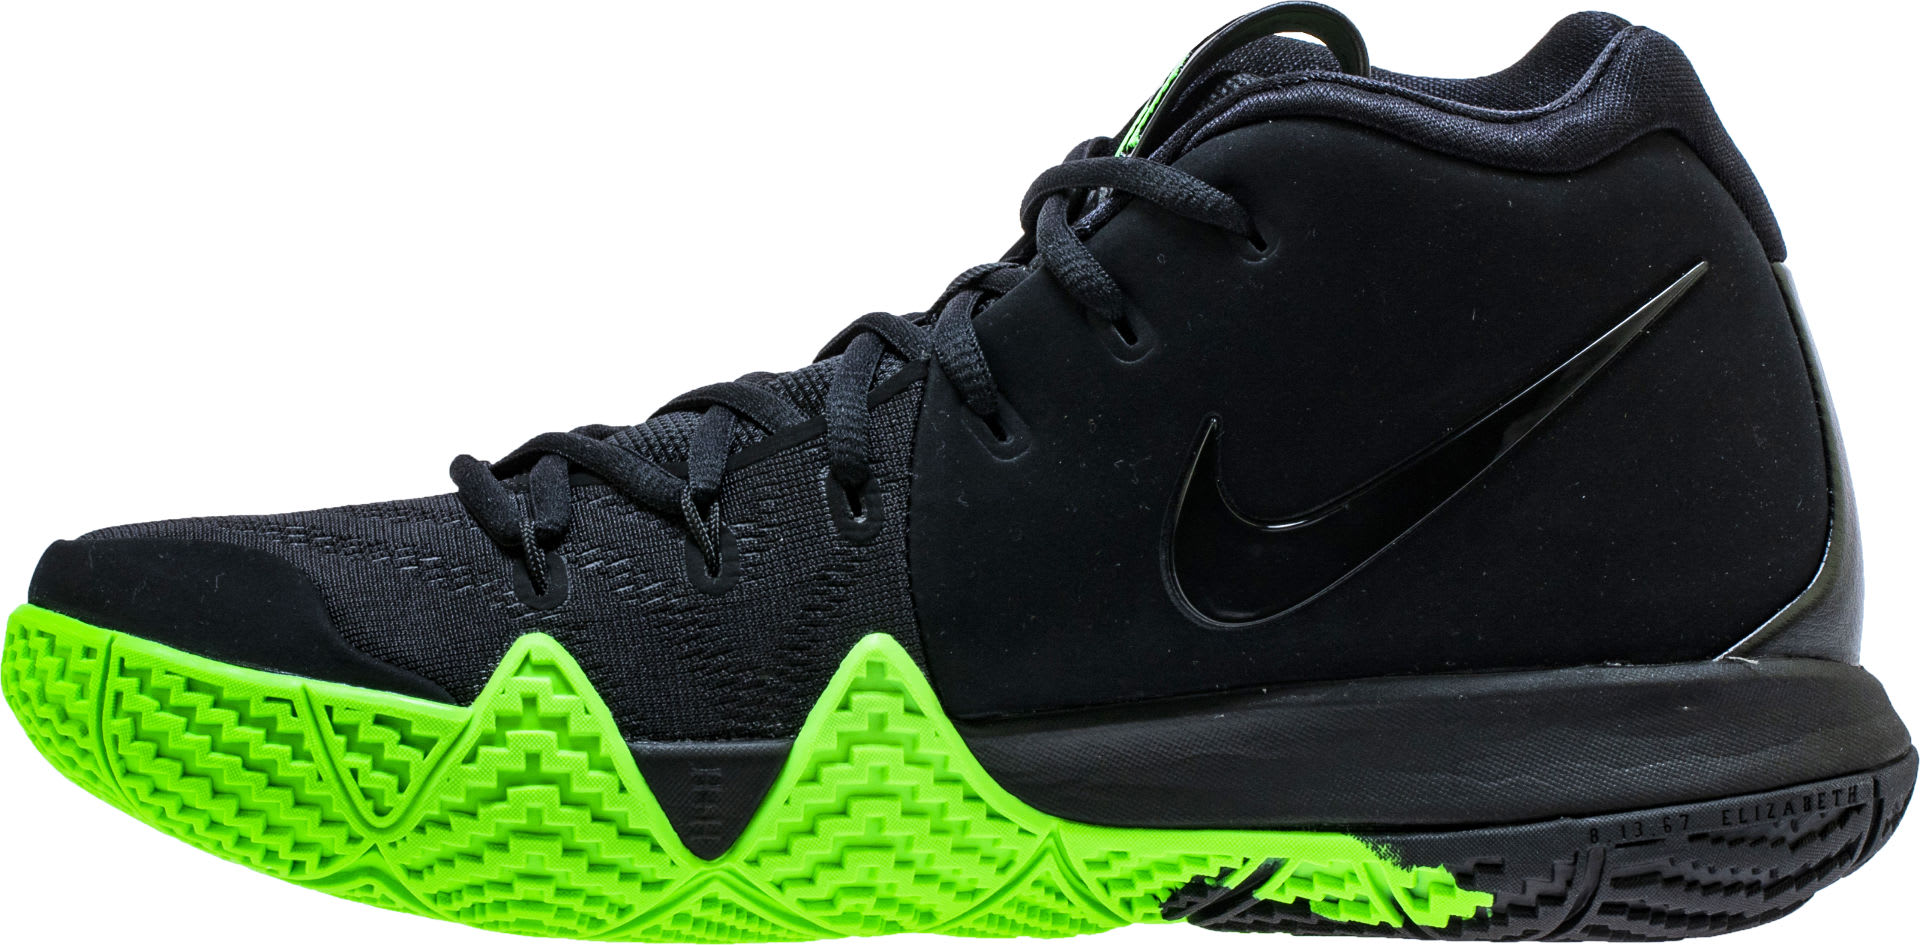 Nike Kyrie 4 Black Rage Green Halloween Release Date 943806-012 Medial